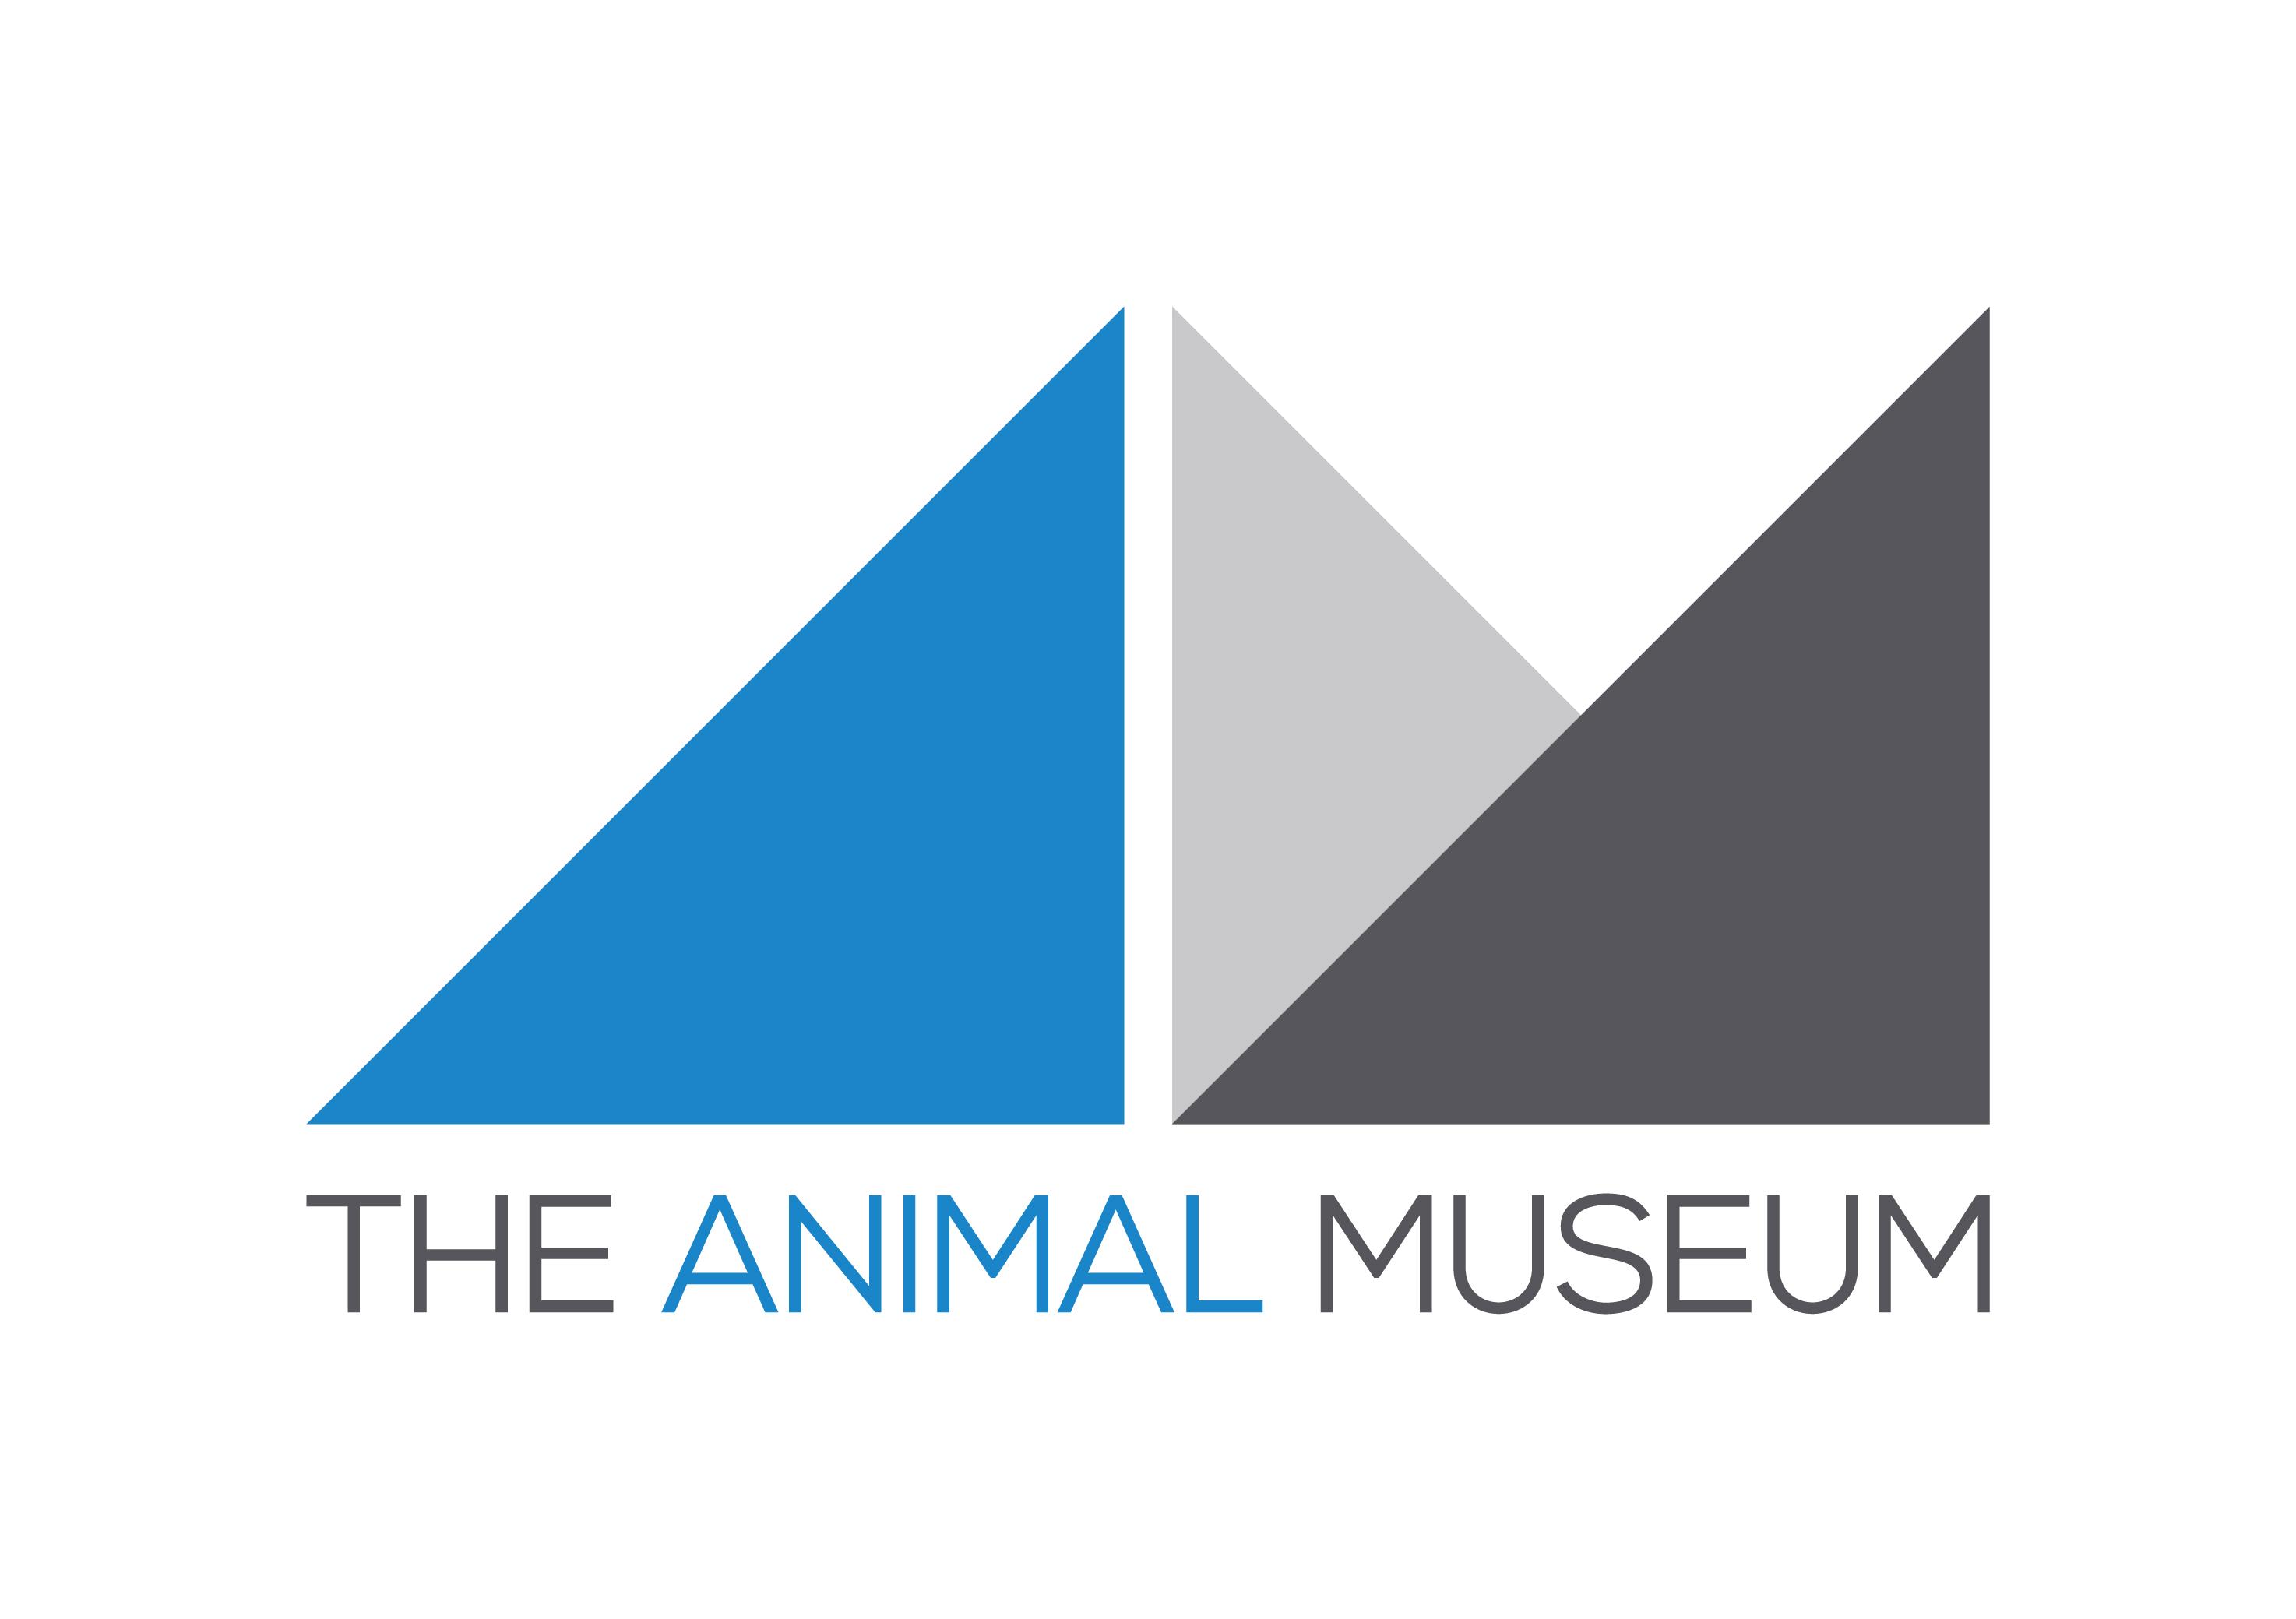 The Animal Museum